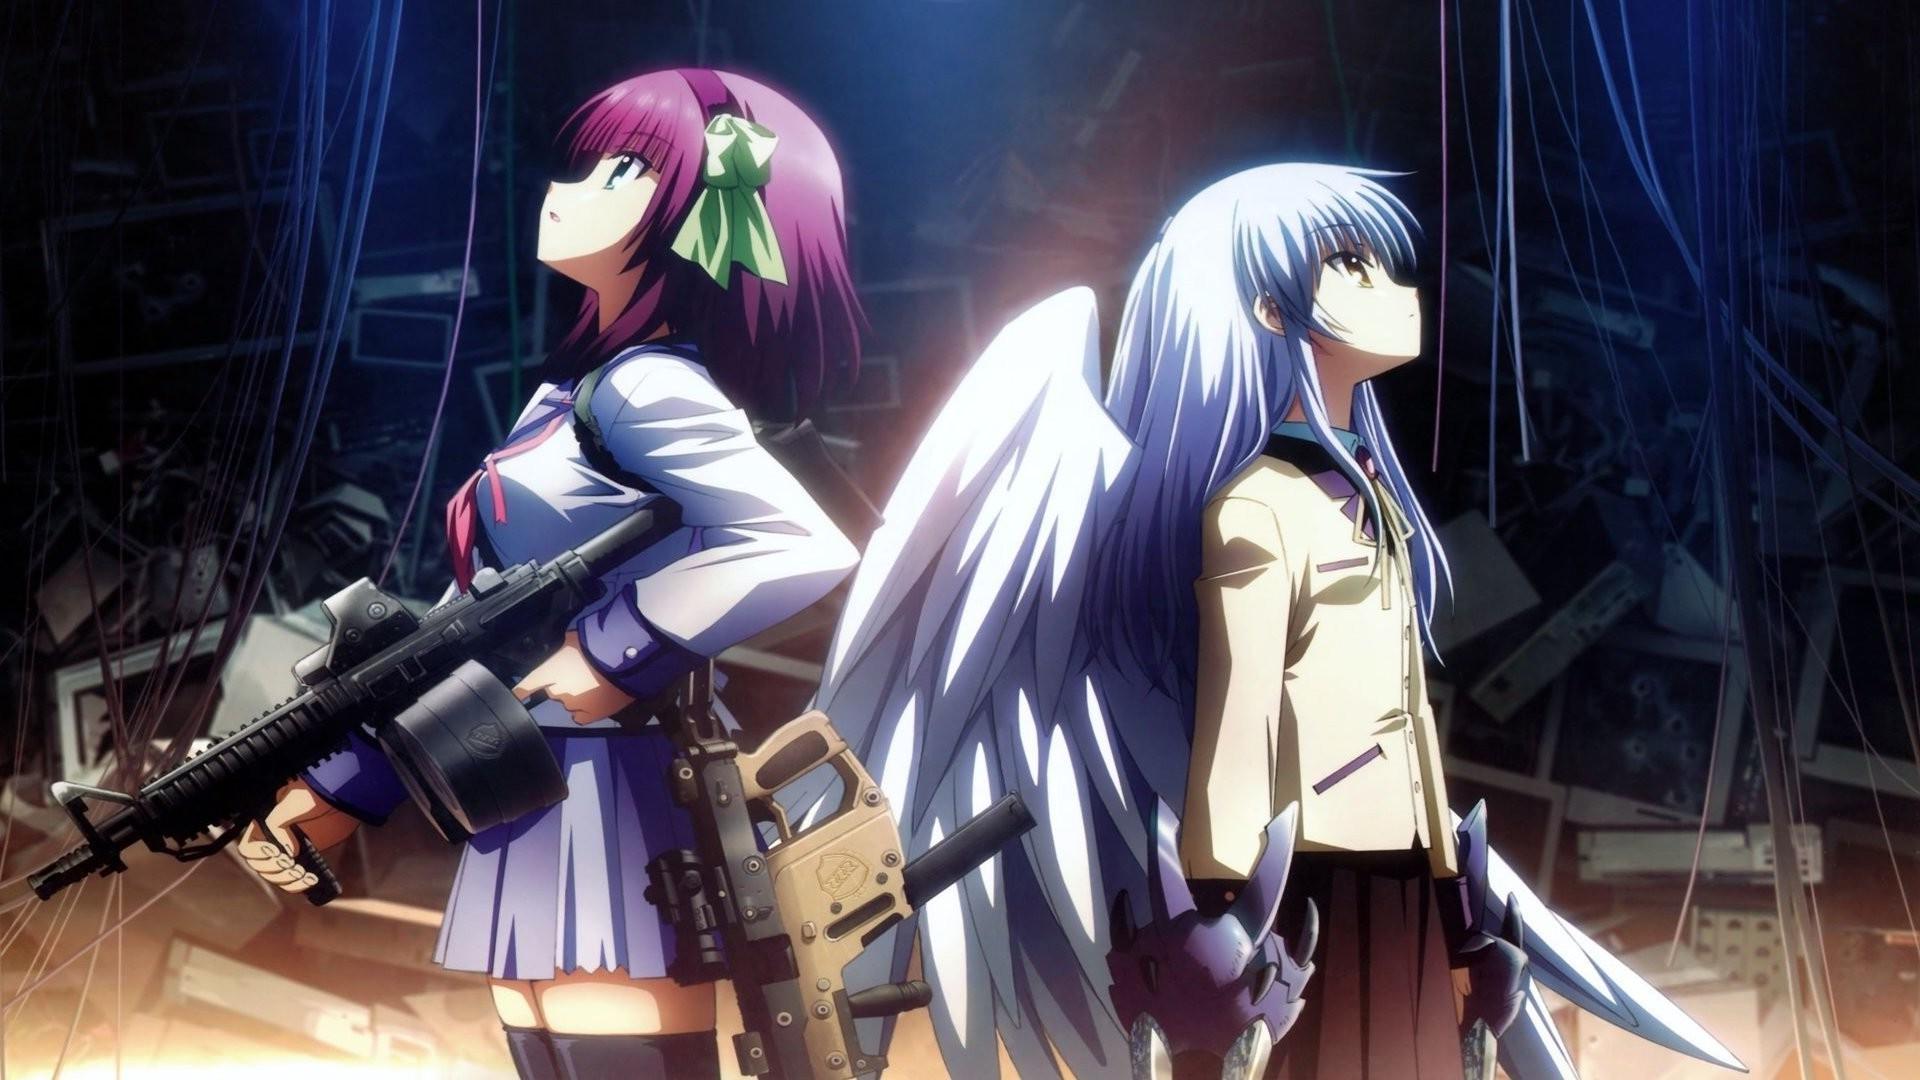 Wallpaper 1920x1080 Px Angel Beats Anime Nakamura Yuri